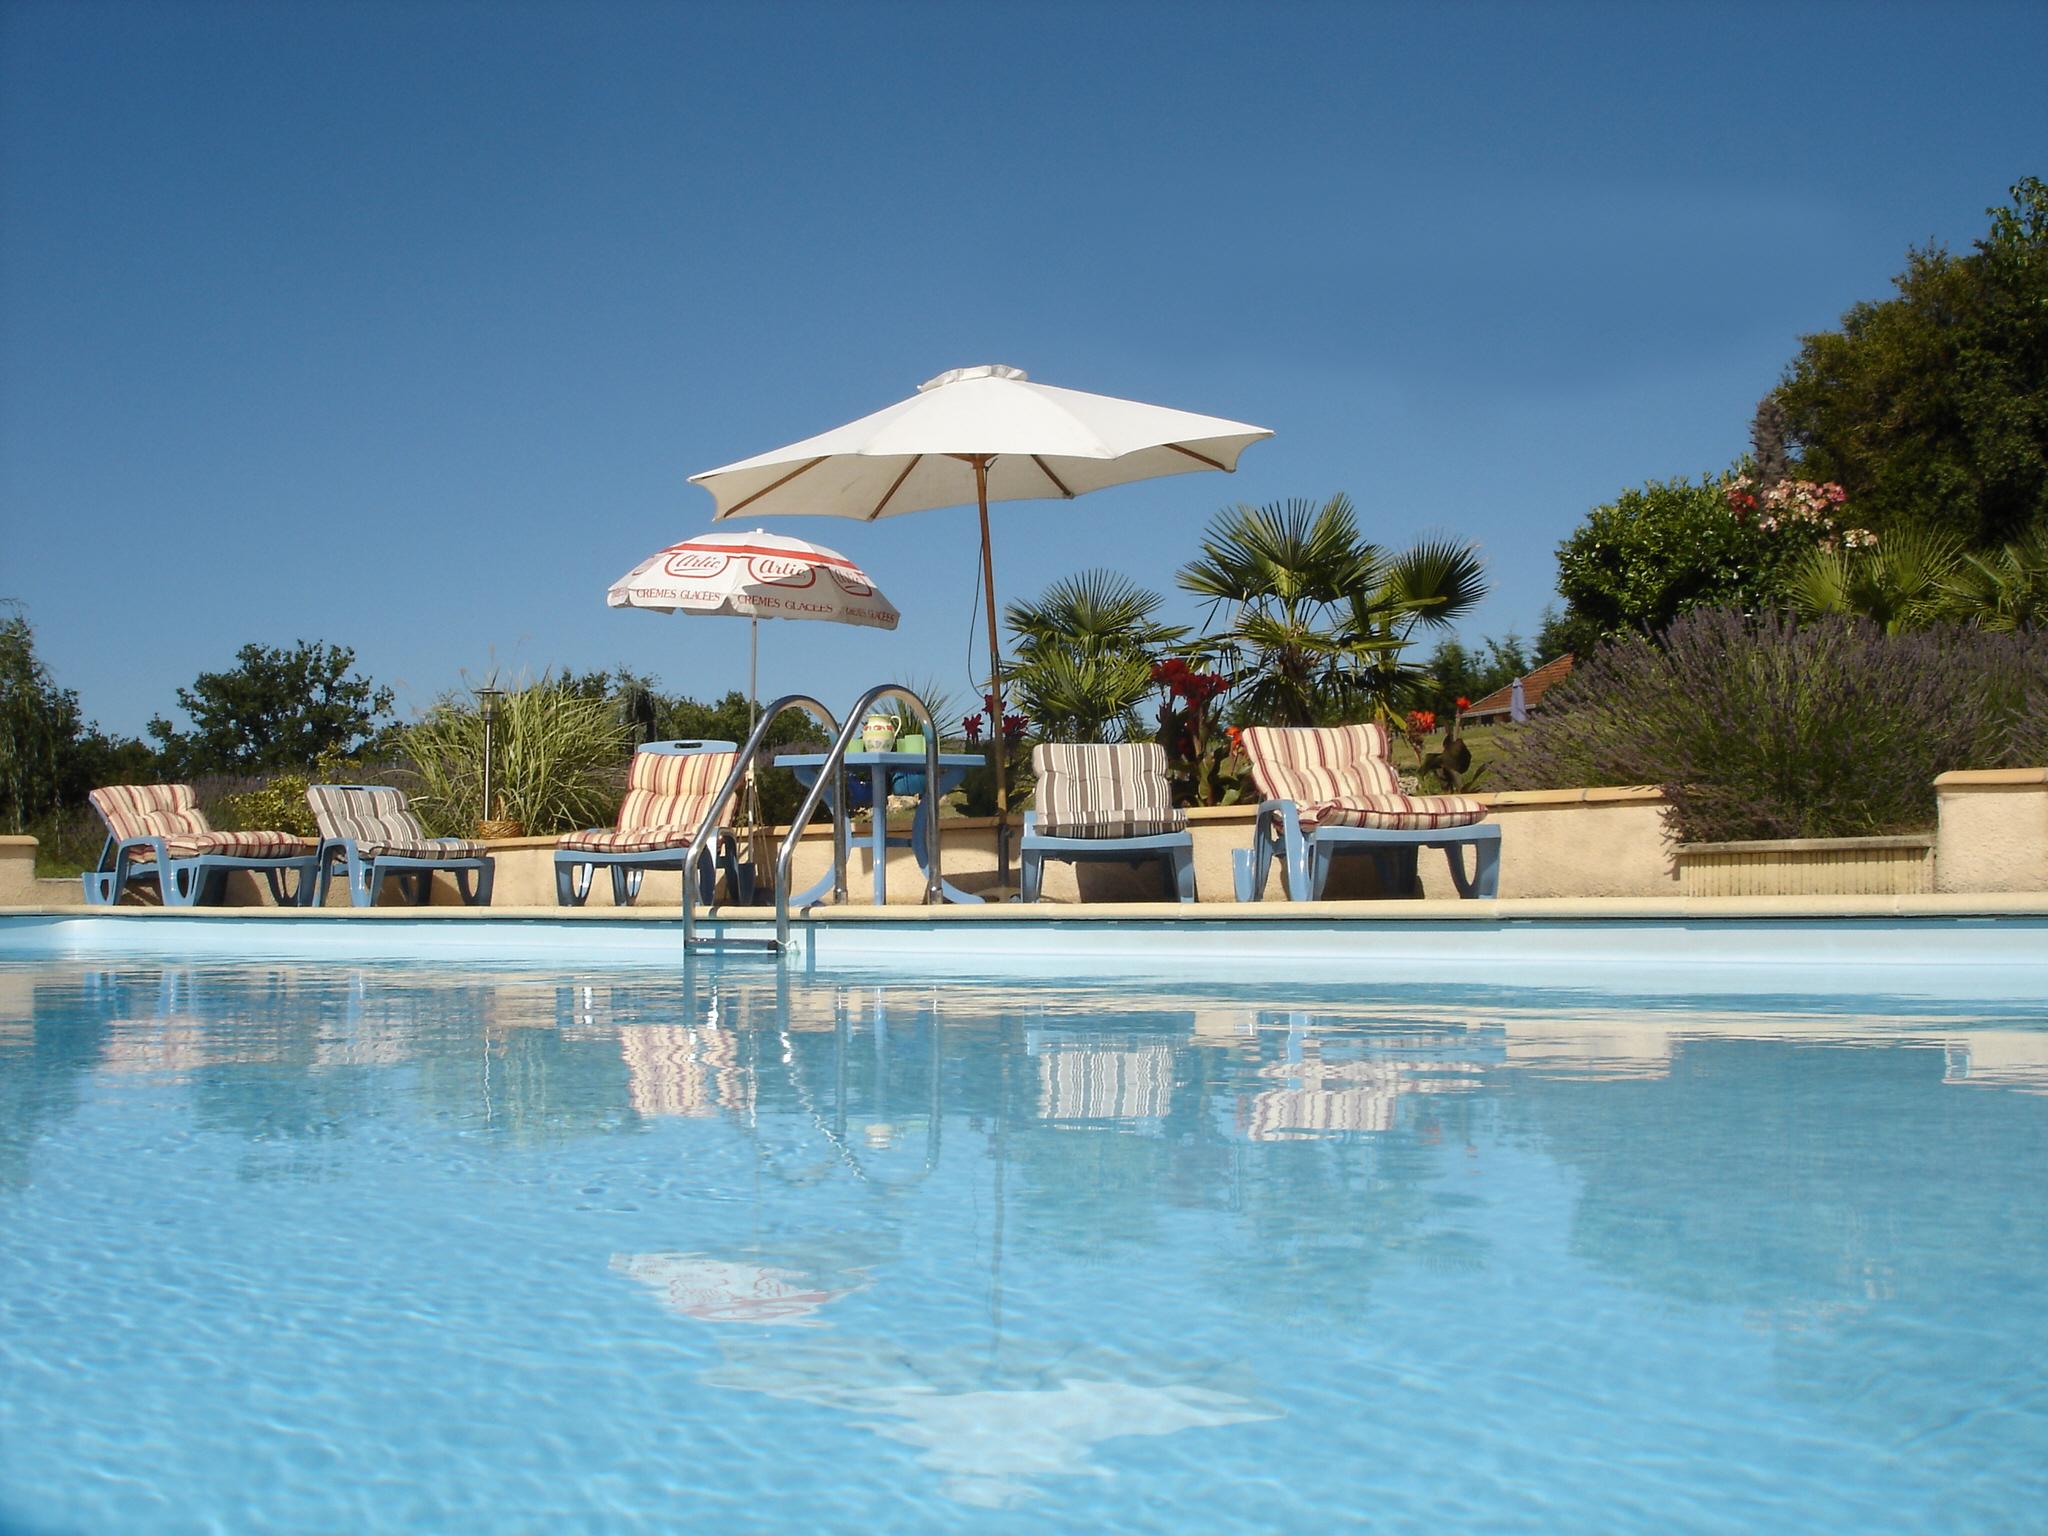 Pool Tournesols